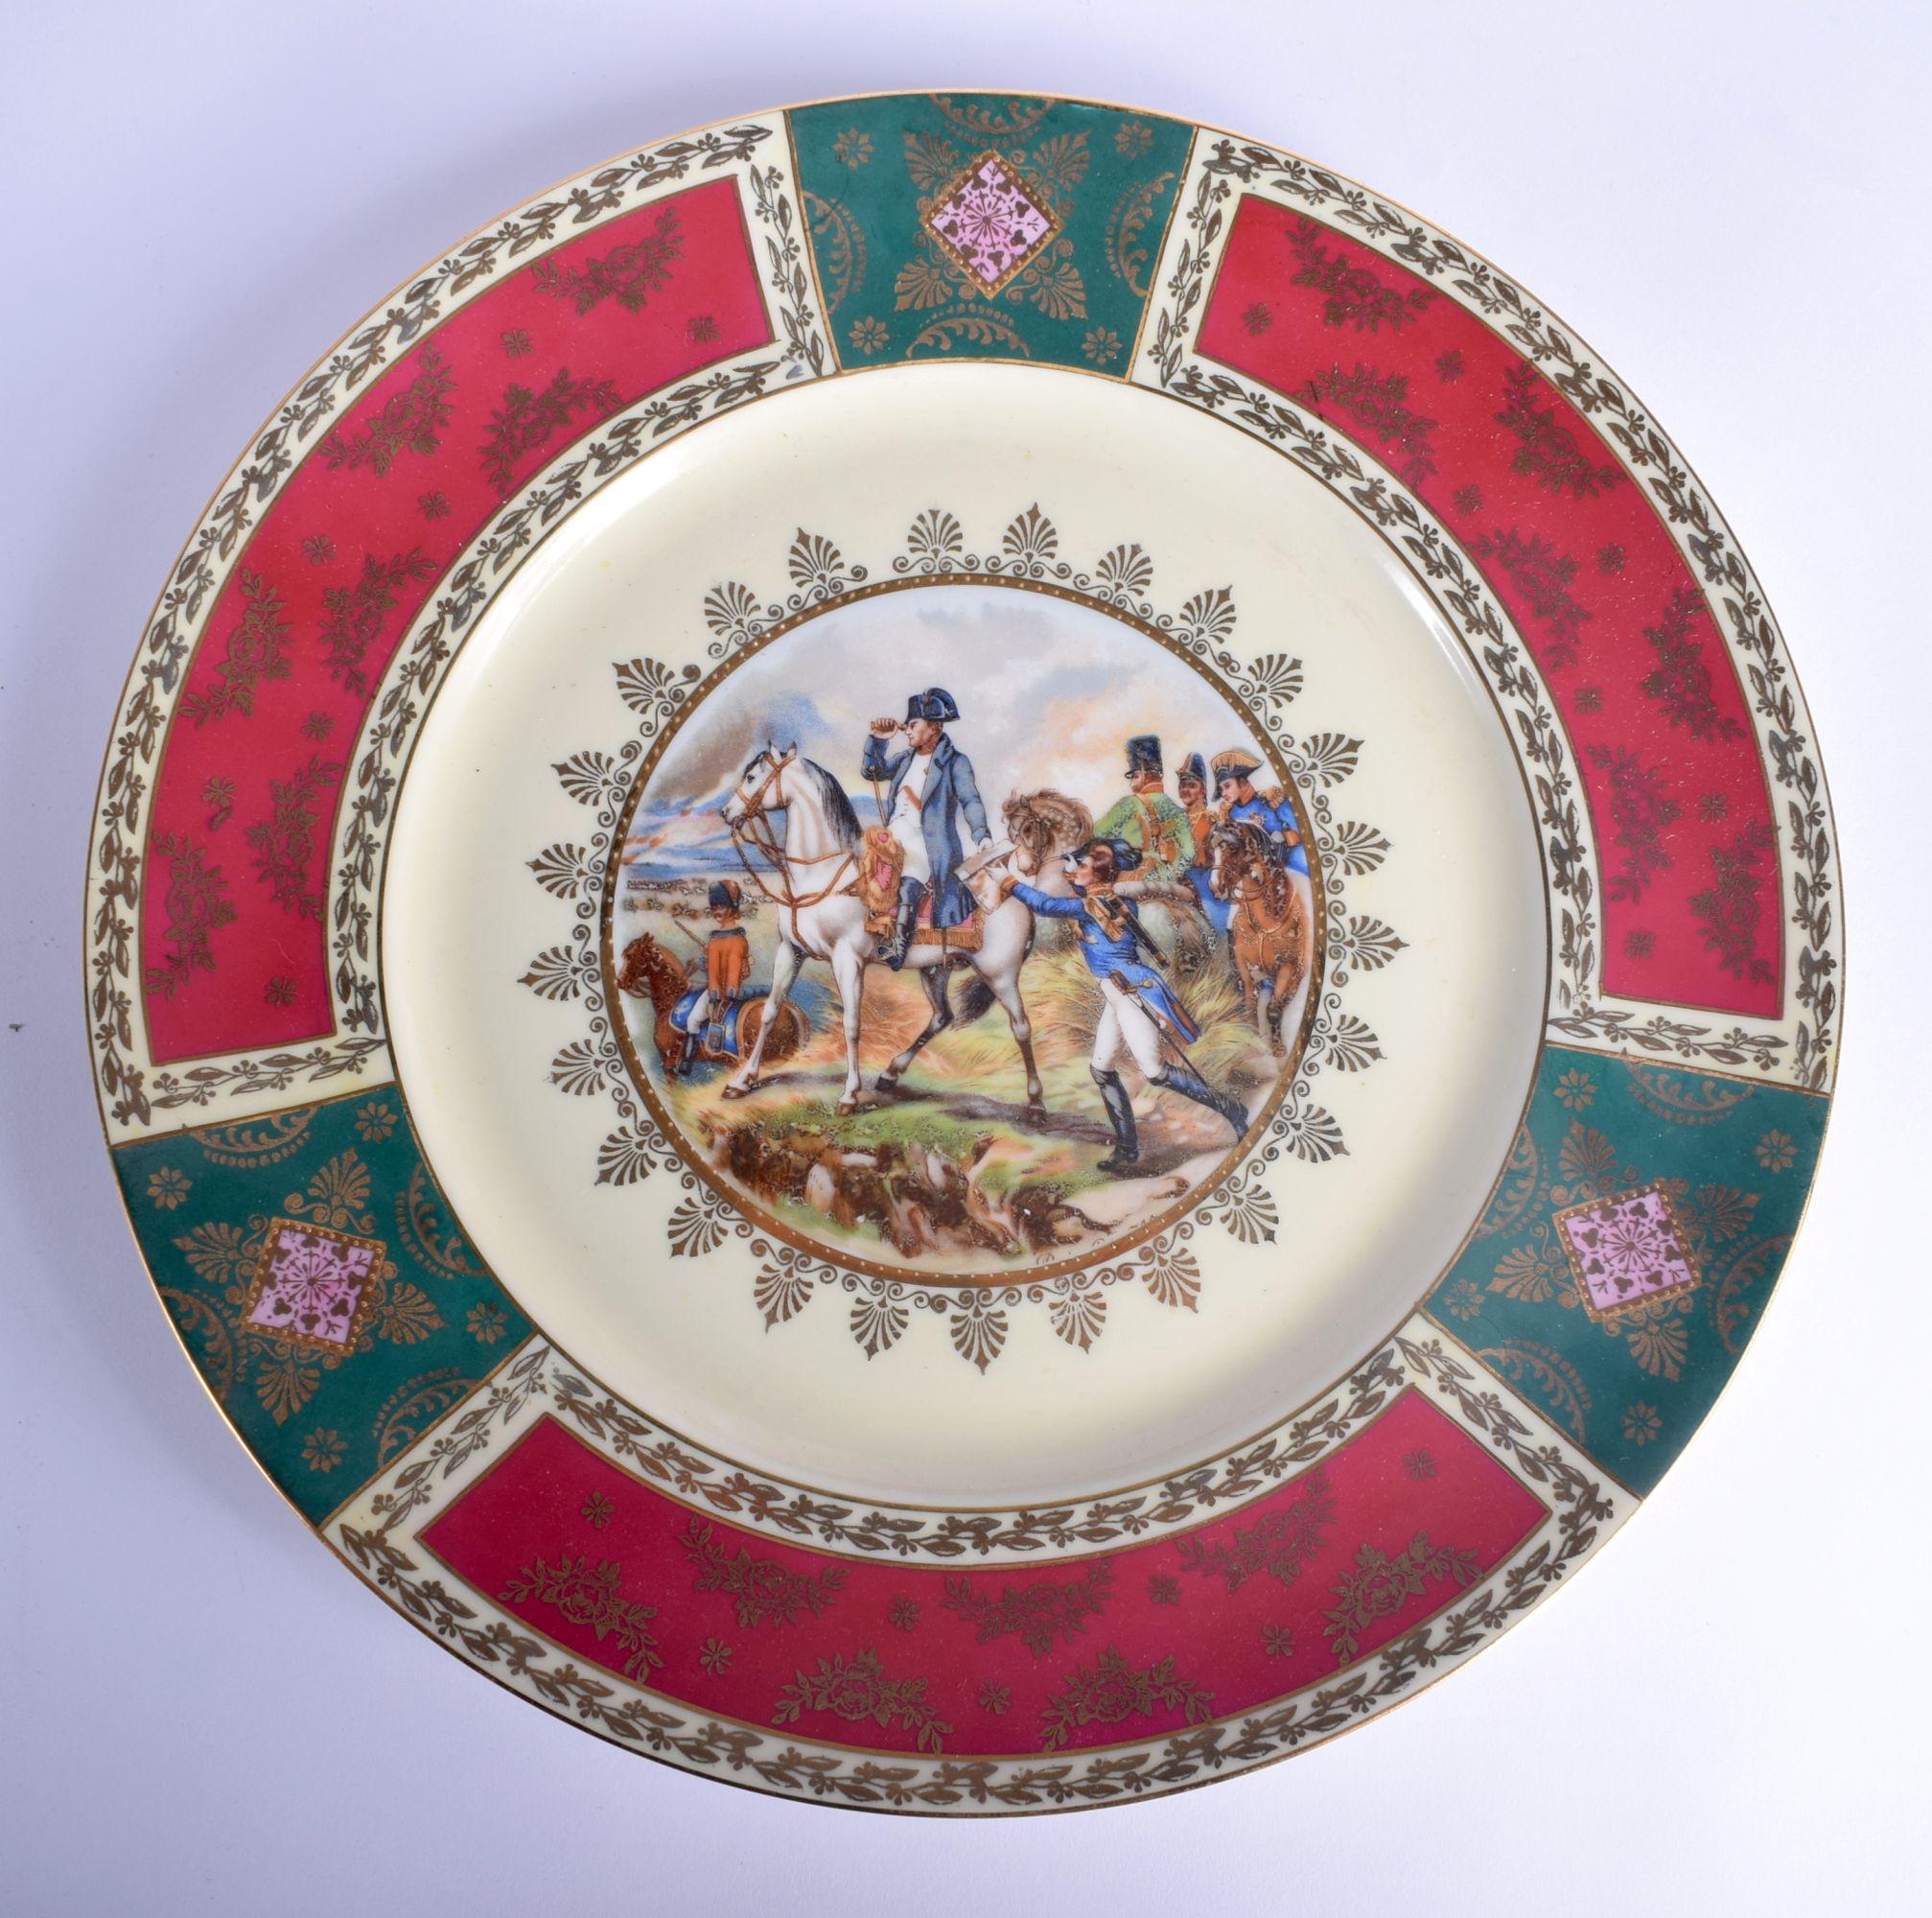 A VINTAGE J K CARLSBAD BAVARIA PORCELAIN VIENNA STYLE TEASET decorated with Napoleonic scenes. Large - Image 4 of 22